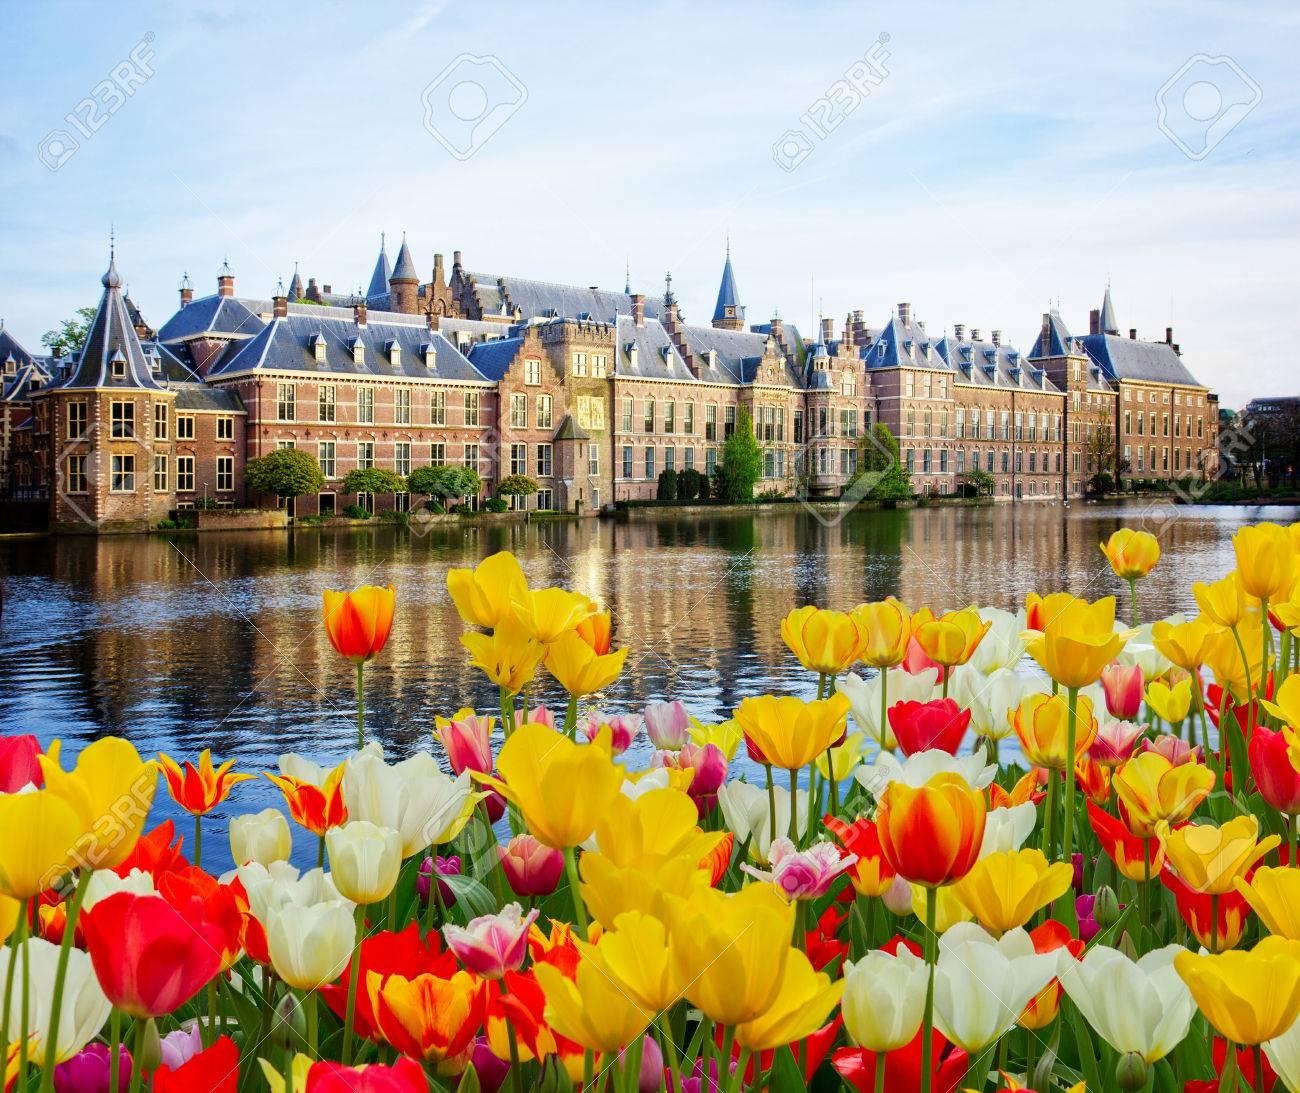 Binnenhof Dutch Parliament , The Hague Den Haag at spring, Netherlands - 69086953